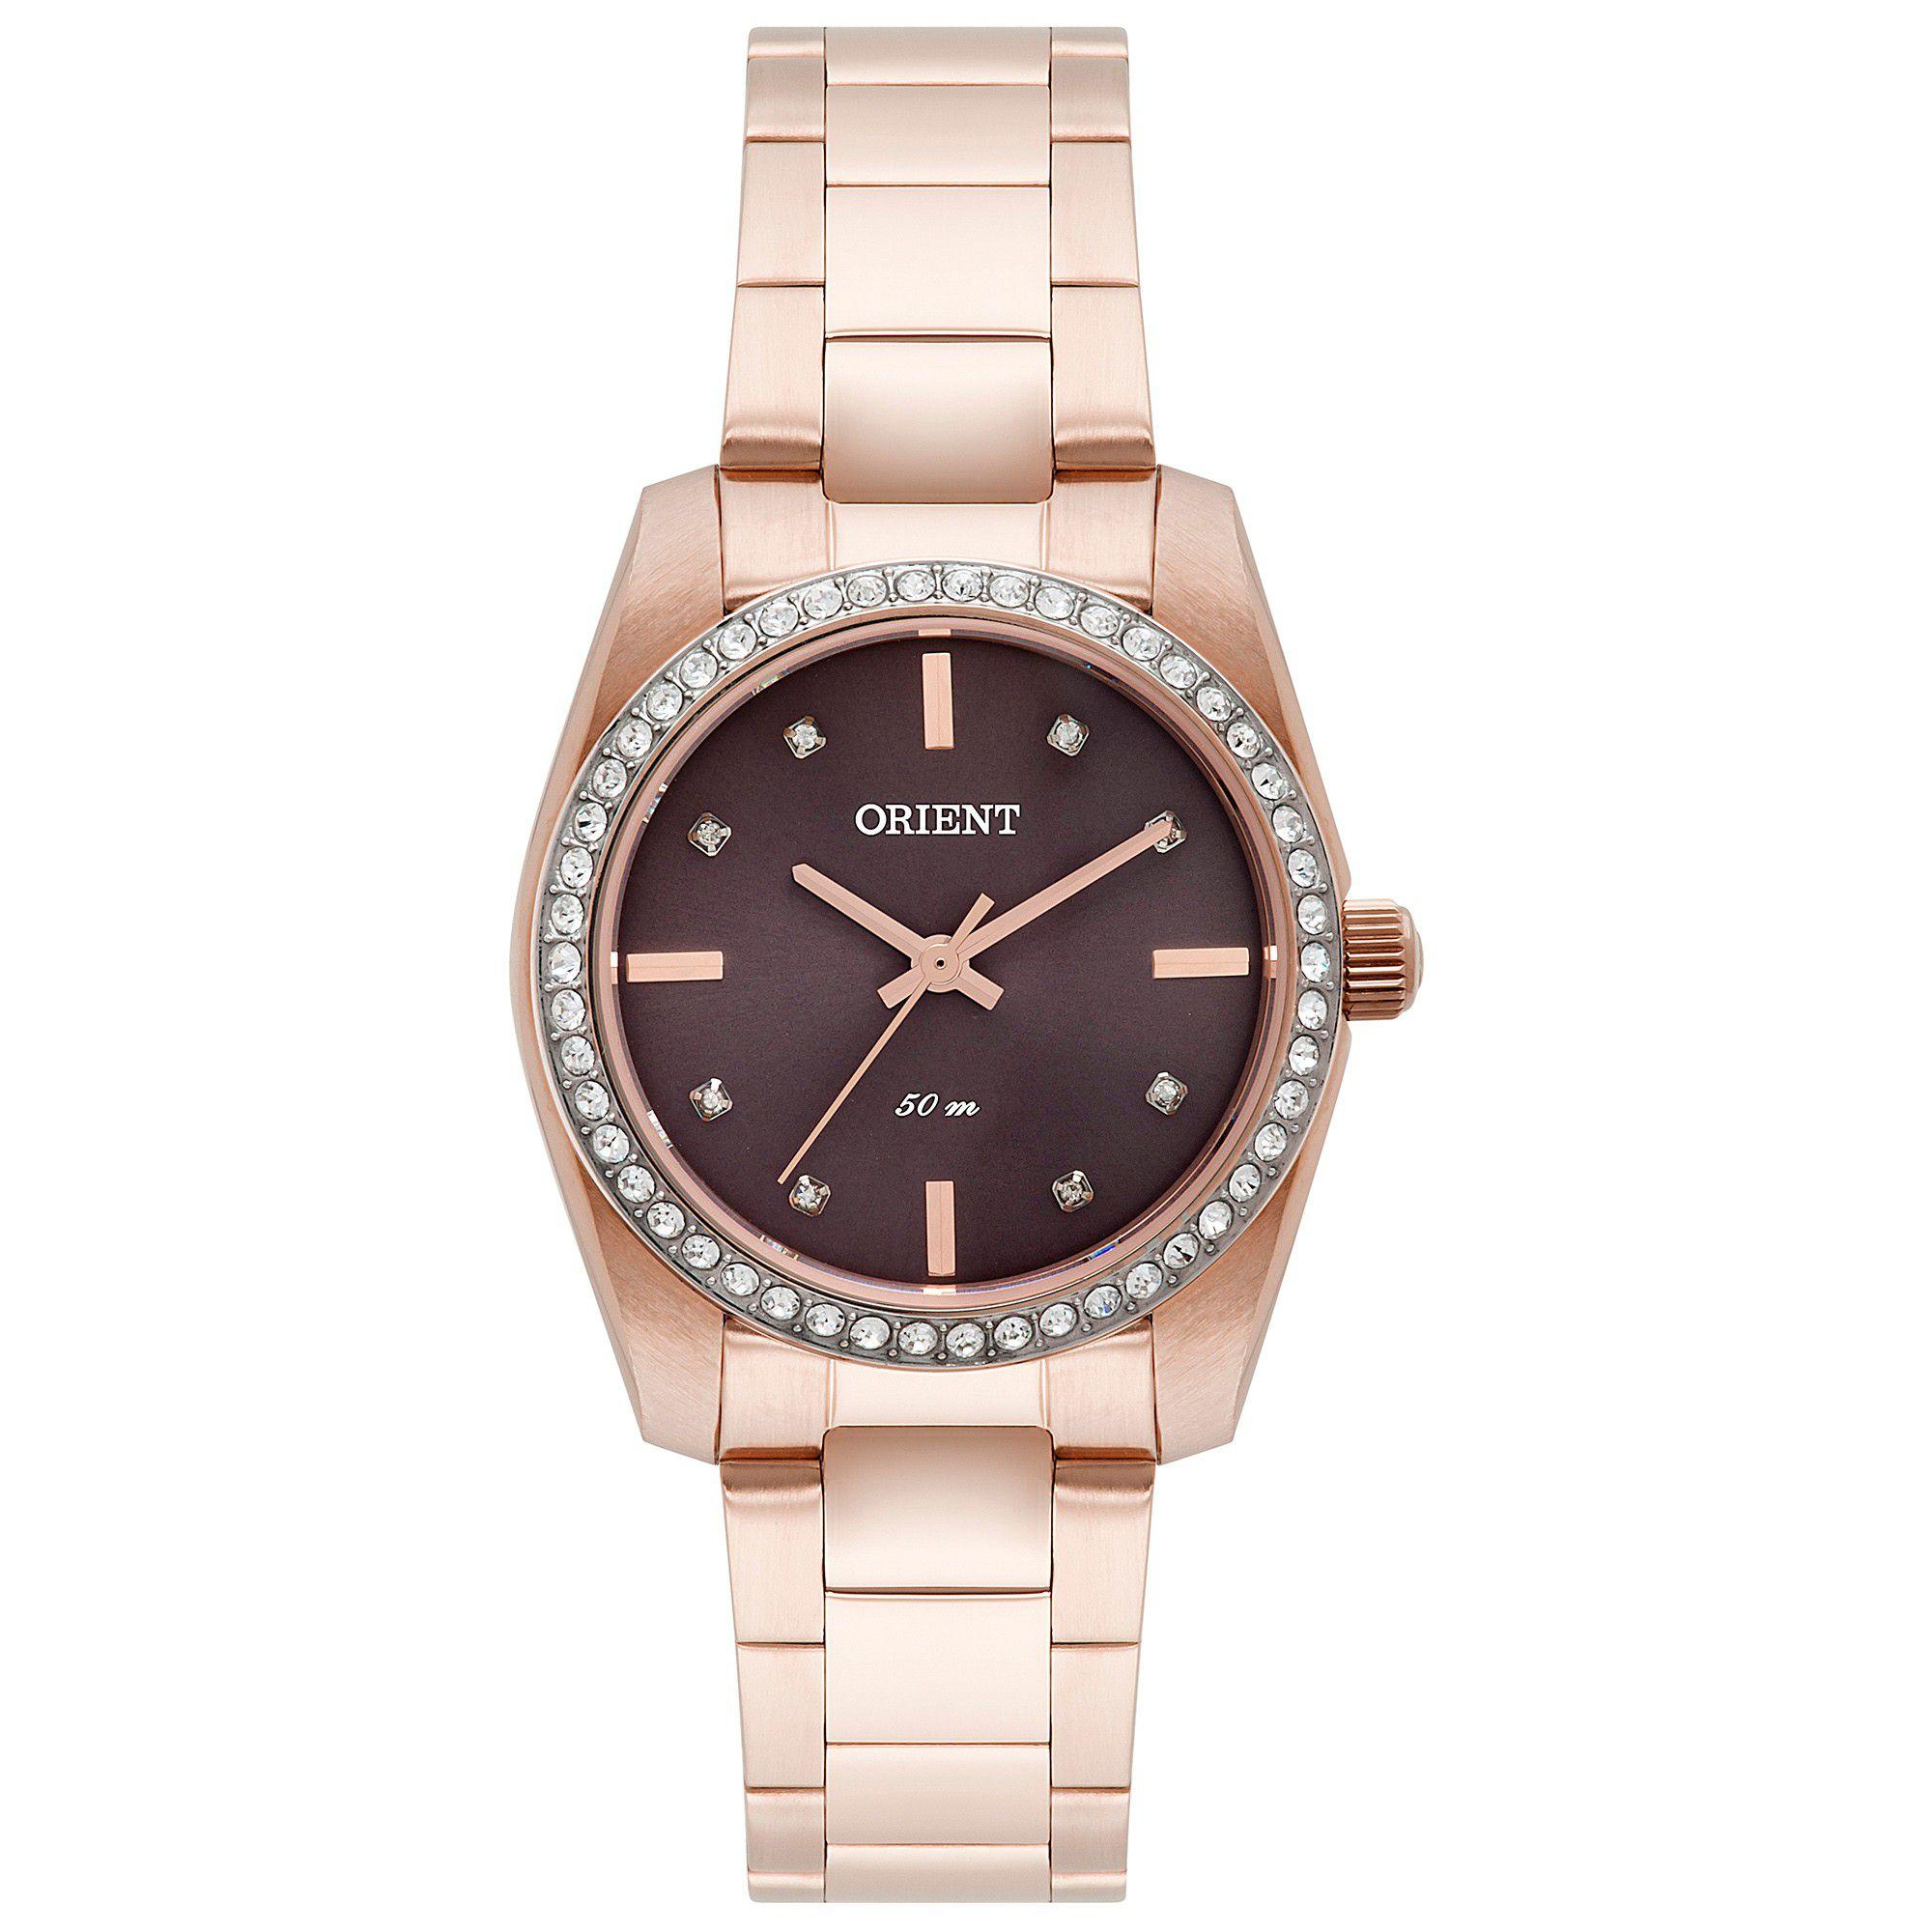 Relógio Feminino Orient FRSS0016 M1RX